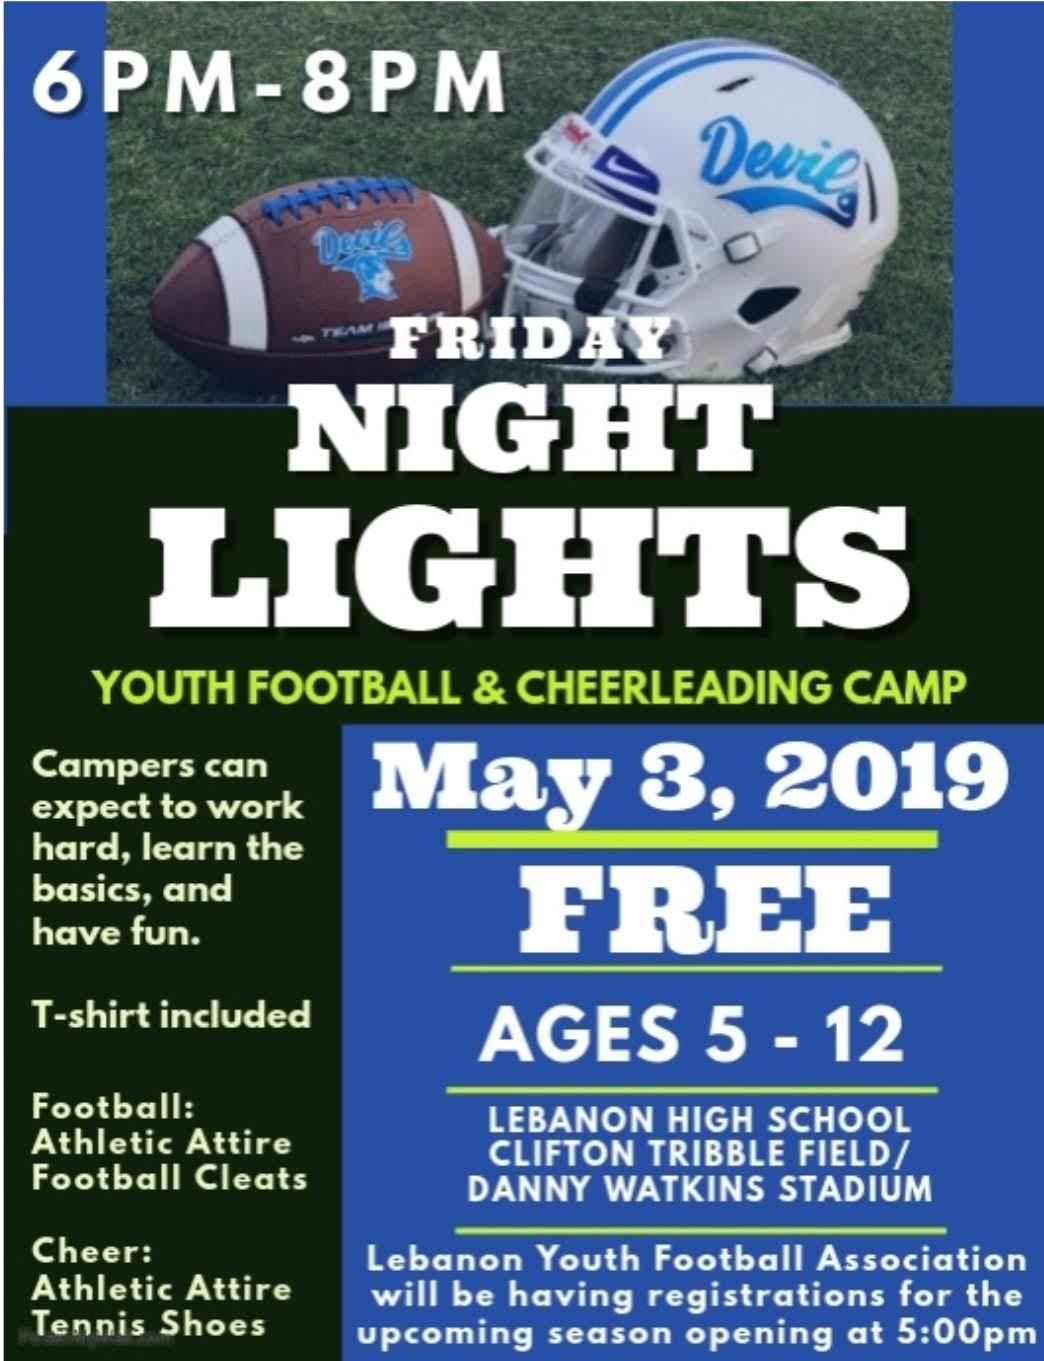 FREE Youth Football & Cheerleading Camp